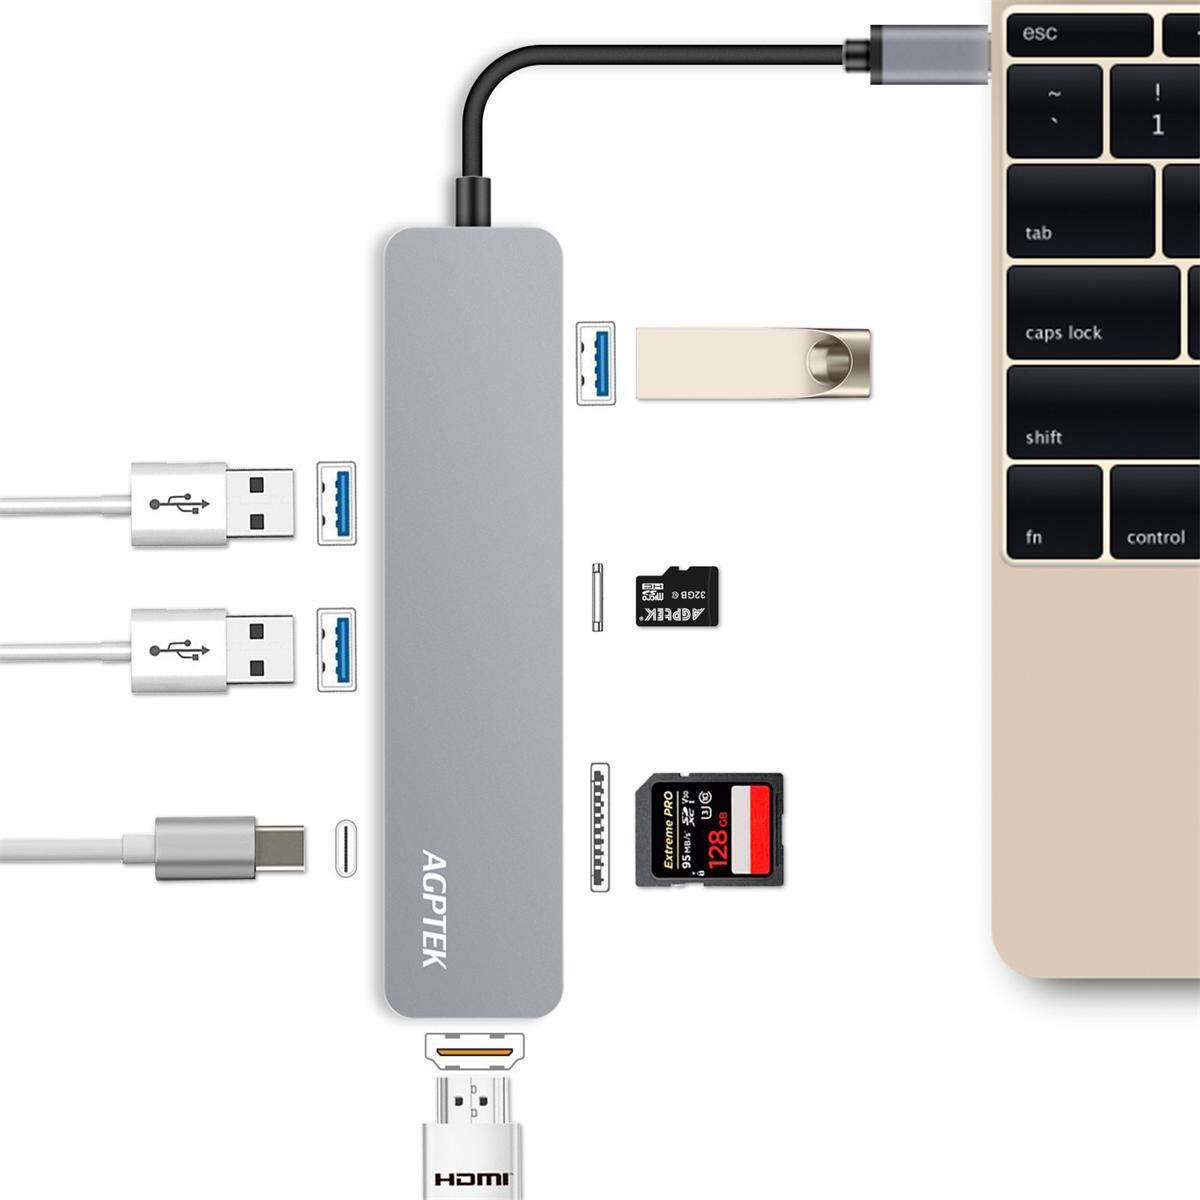 AGPTEK USB-C ハブ 多機能7-in-1 4K HDMI出力 タイプ C マルチ変換アダプター USB C アダプター USB Type-Cハブ Tpye-C 充電ポート/4k HDMI/SD/TFカードスロット/3*USB 3.0ポート MacBook/MacBook Pro/Samsung Chromebook Plusに対応(シルバー)